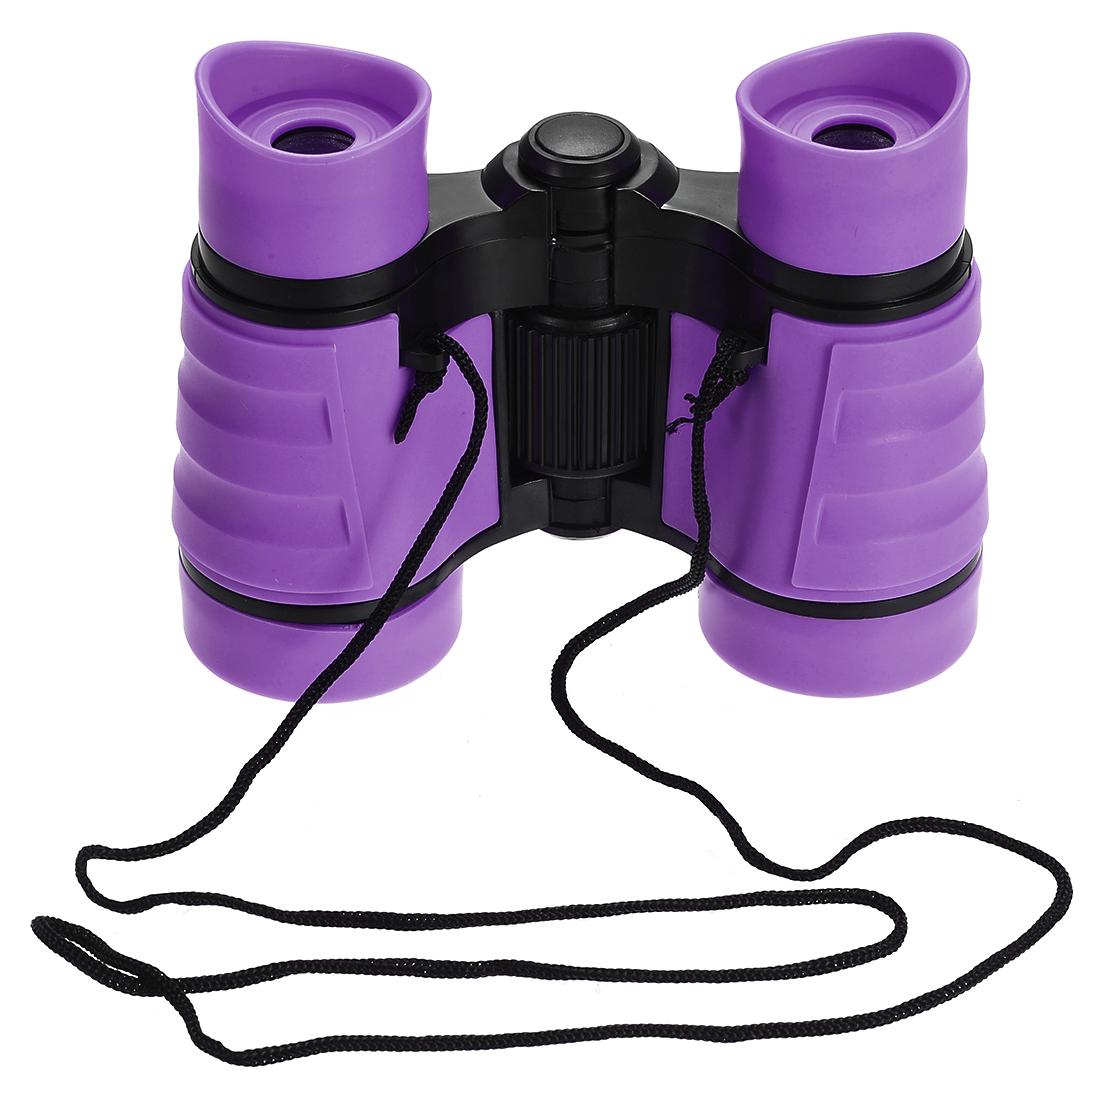 Toy Binoculars 4X30 Compact Foldable Binoculars Purple with Neck Strap